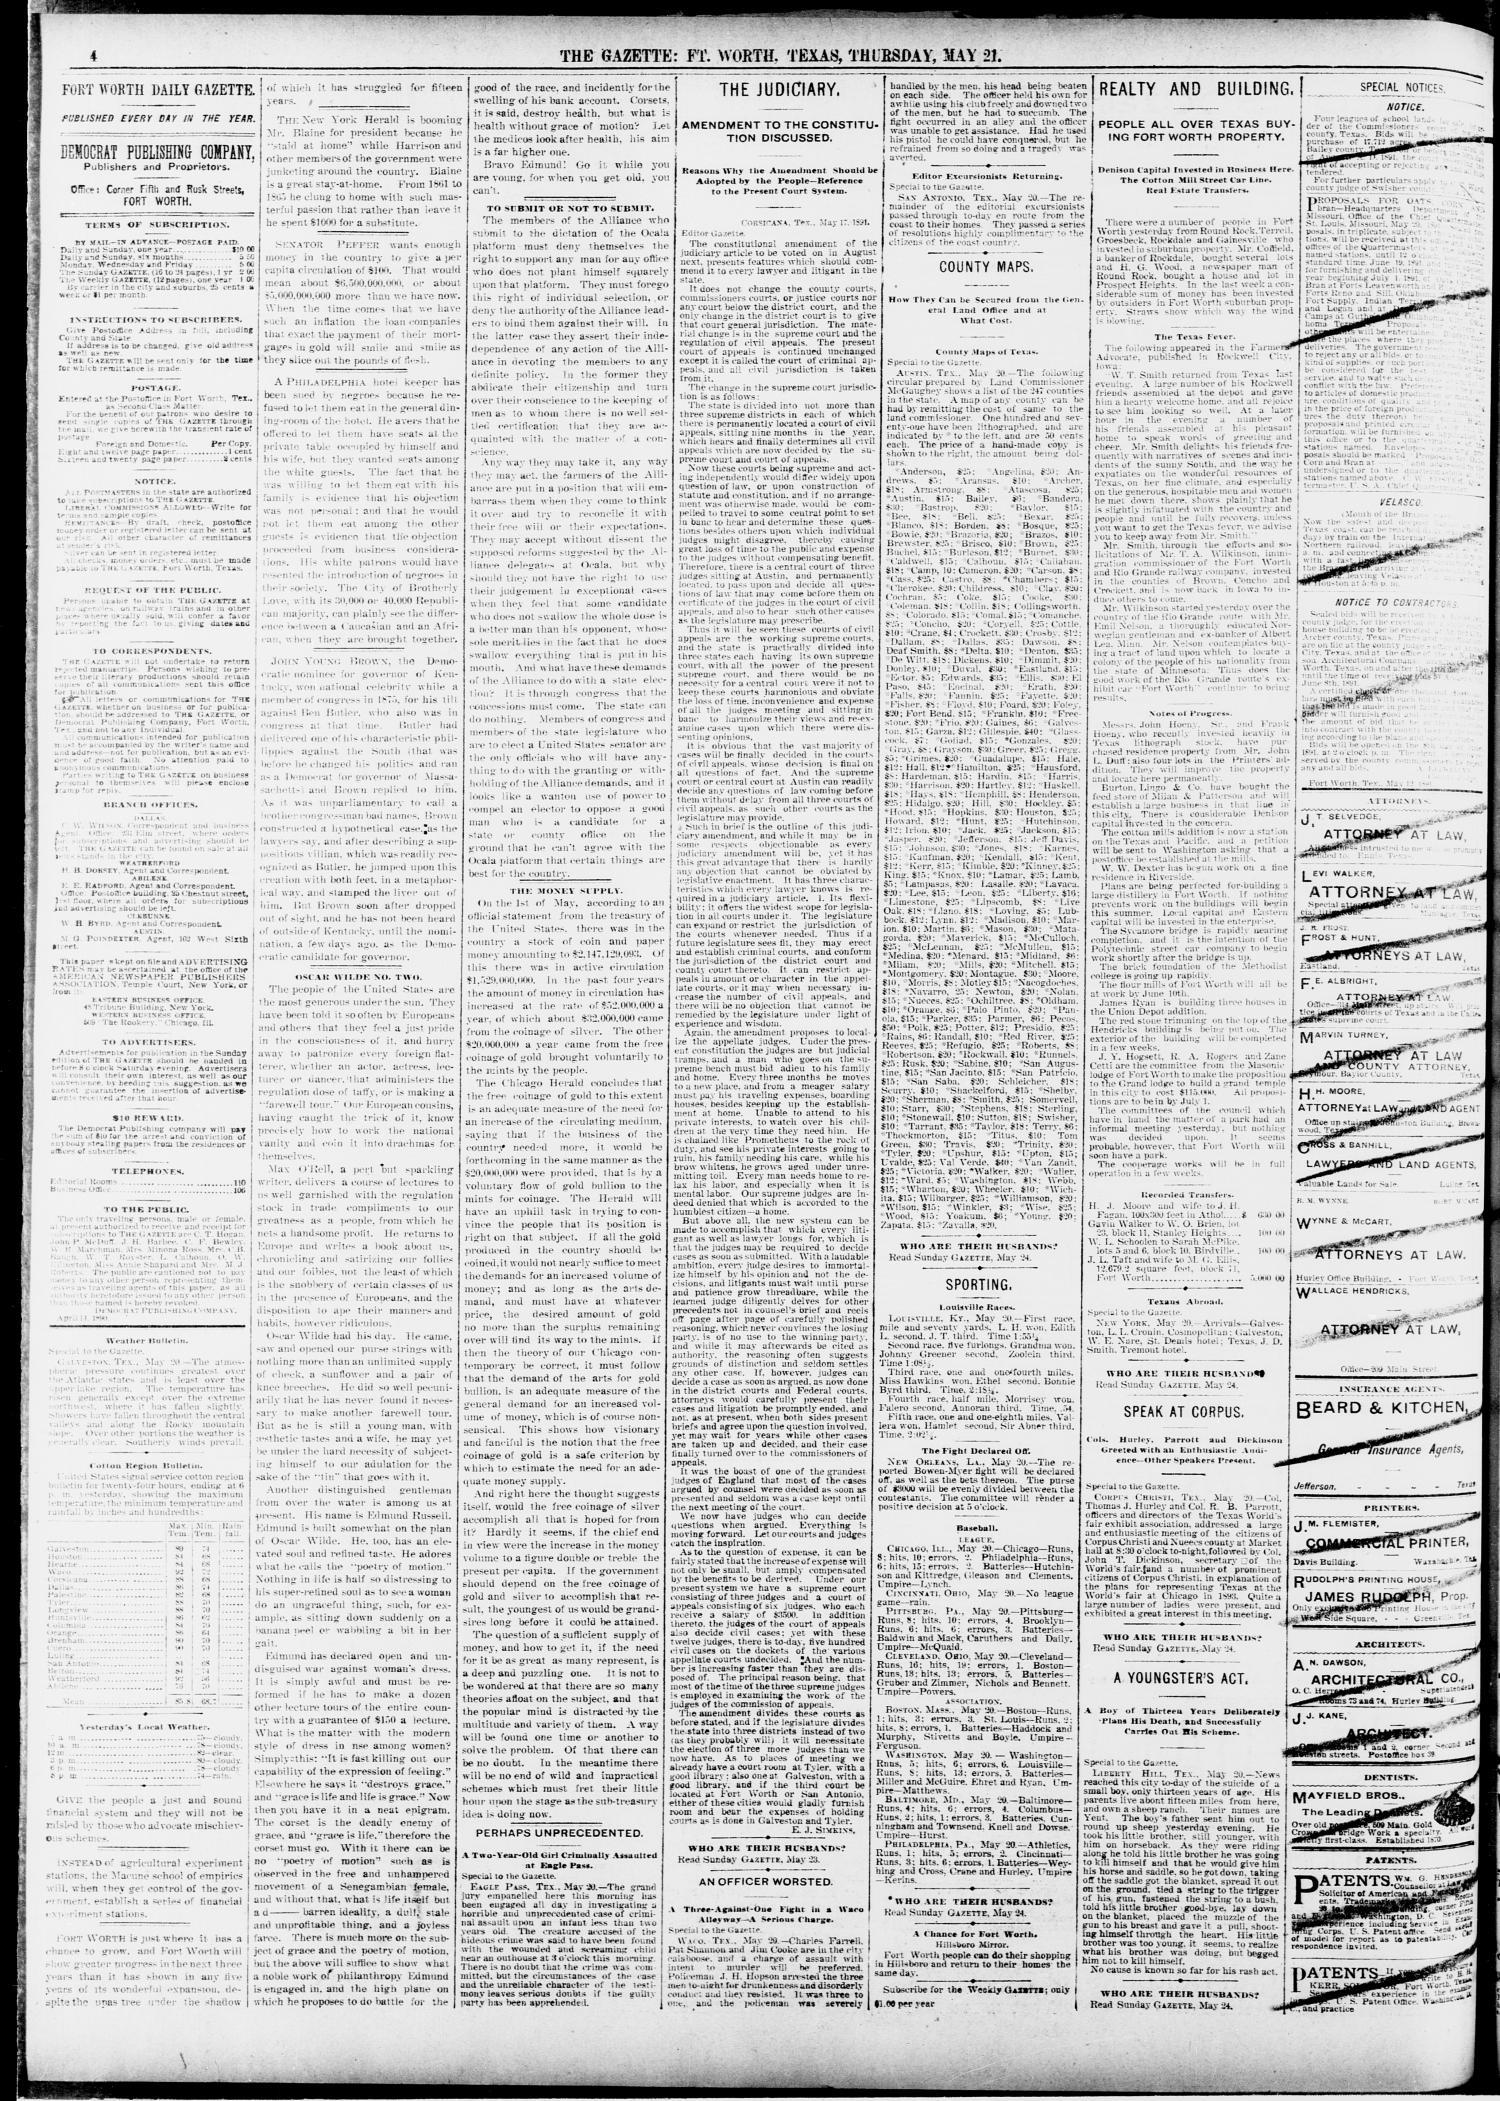 Fort Worth Gazette  (Fort Worth, Tex ), Vol  13, No  24, Ed